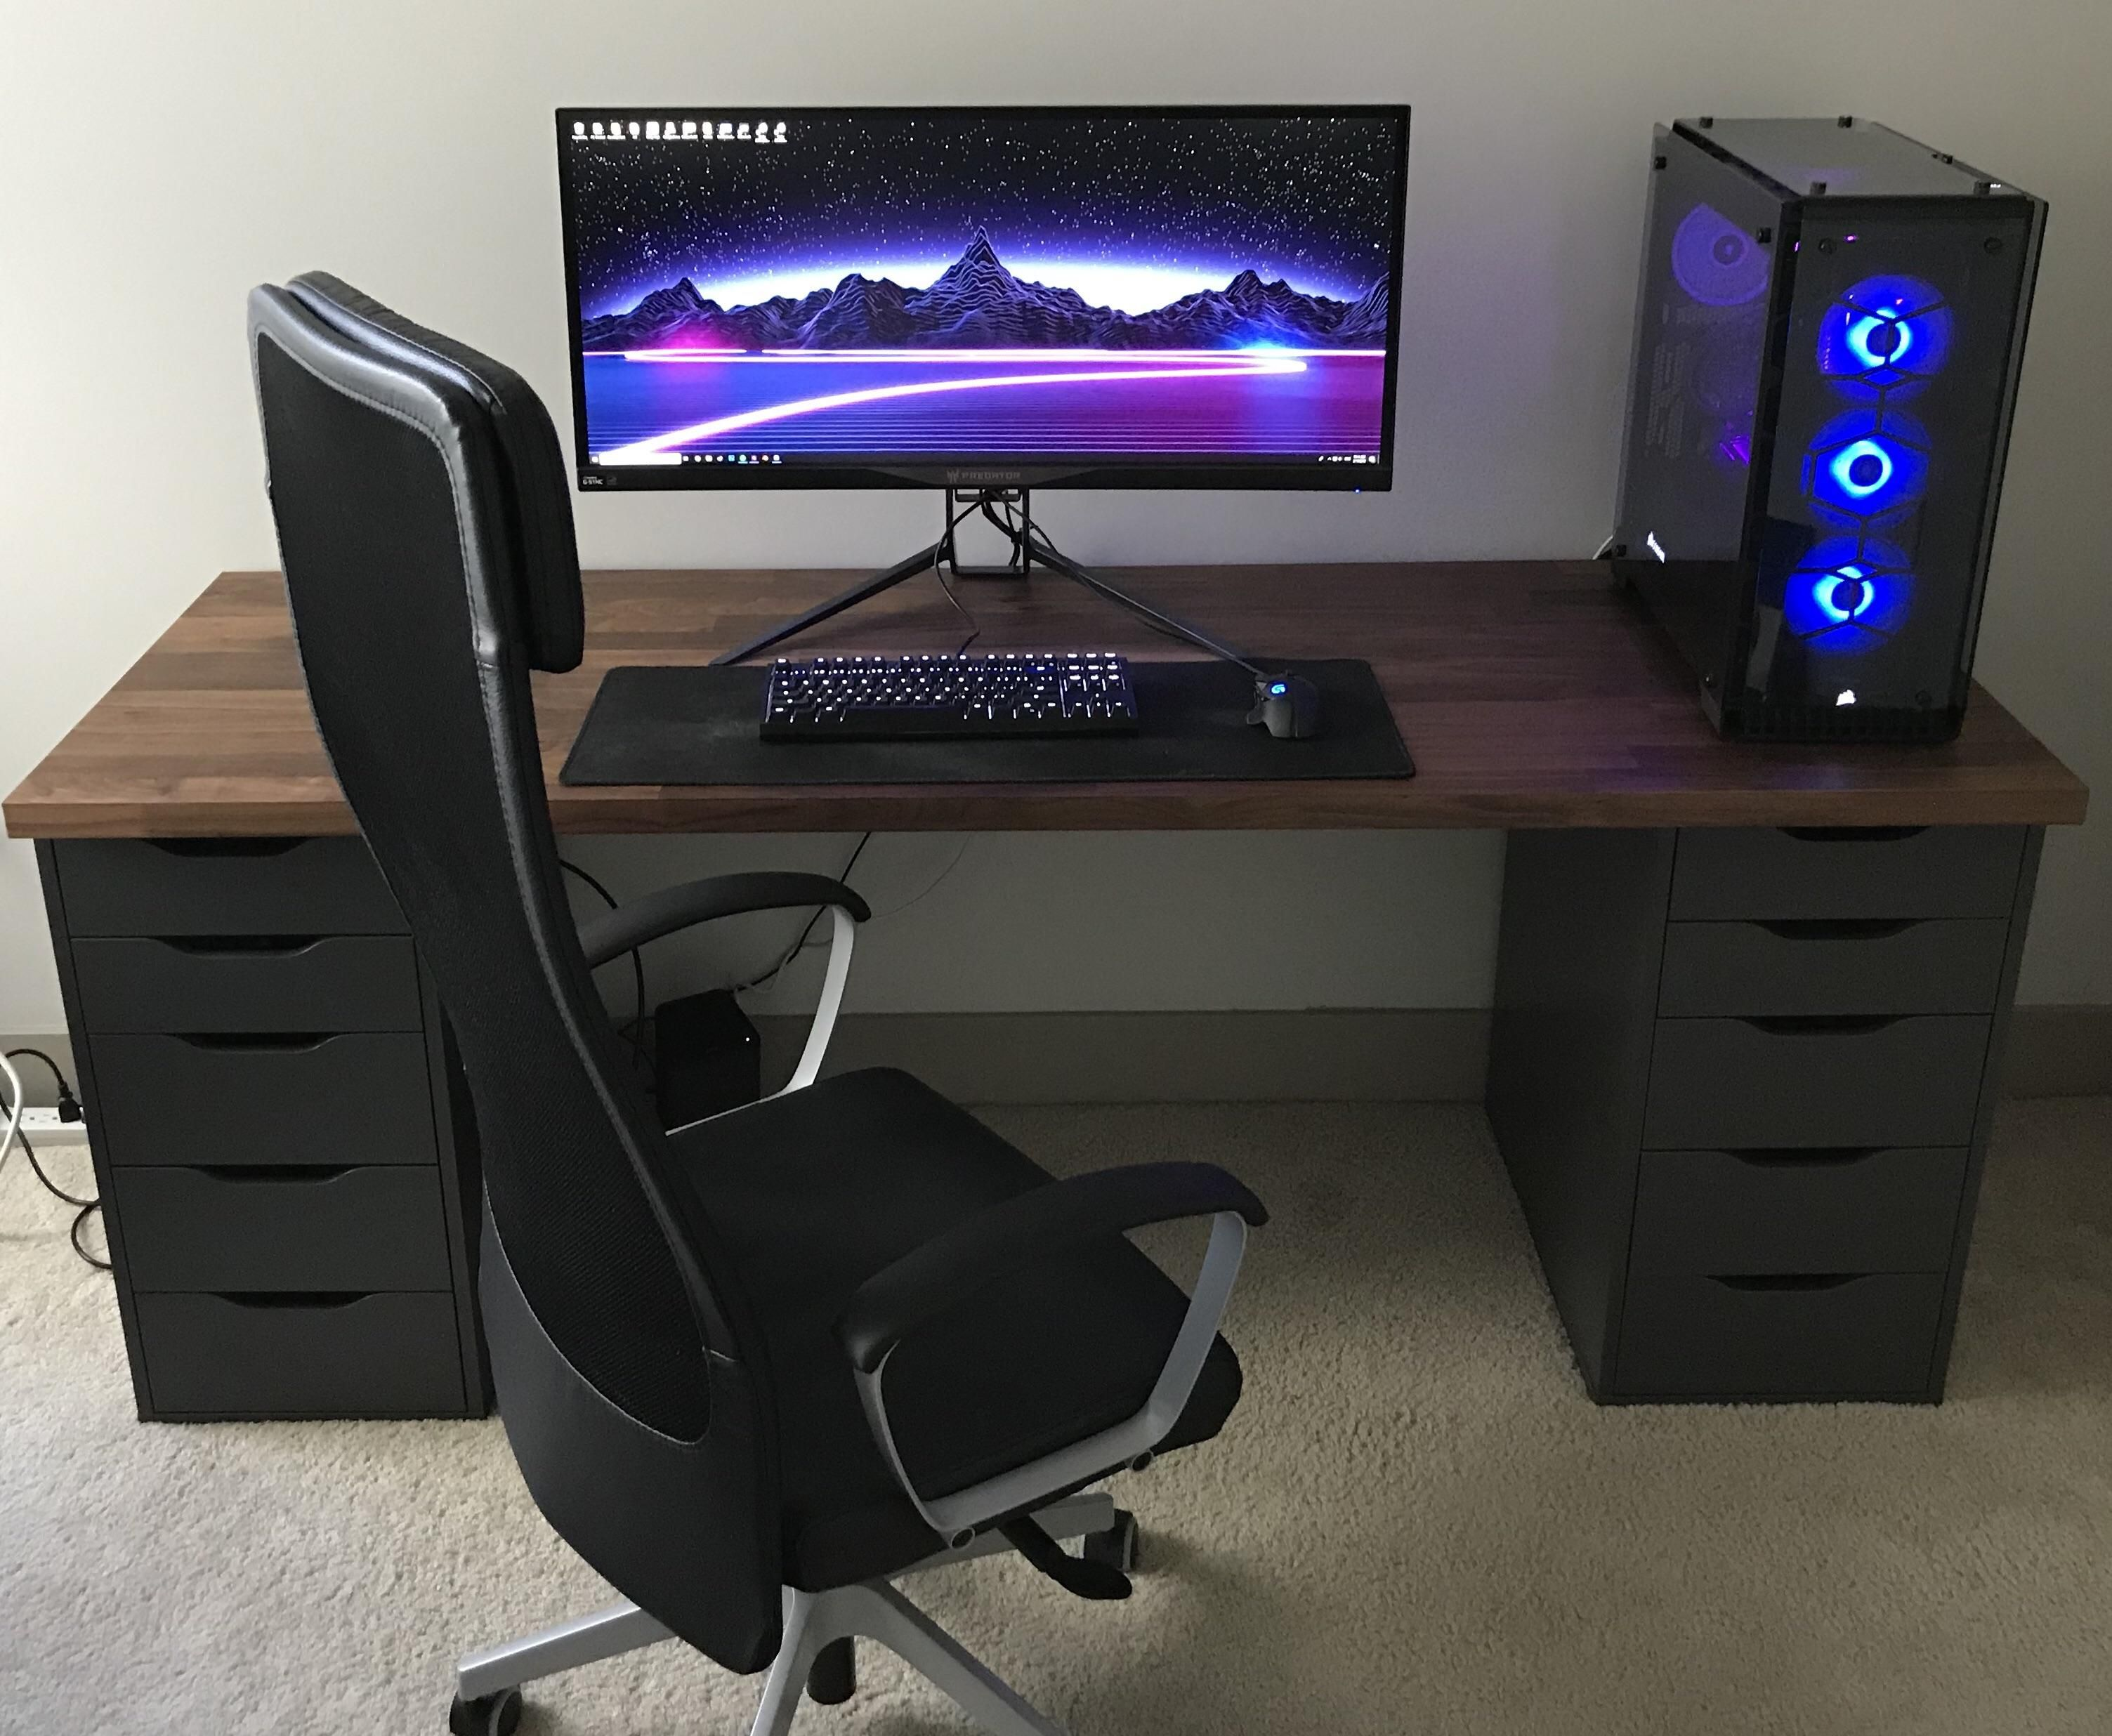 Minimalist Ikea Driven Battlestation Office Computer Desk Setup Gaming Room Setup Home Office Setup